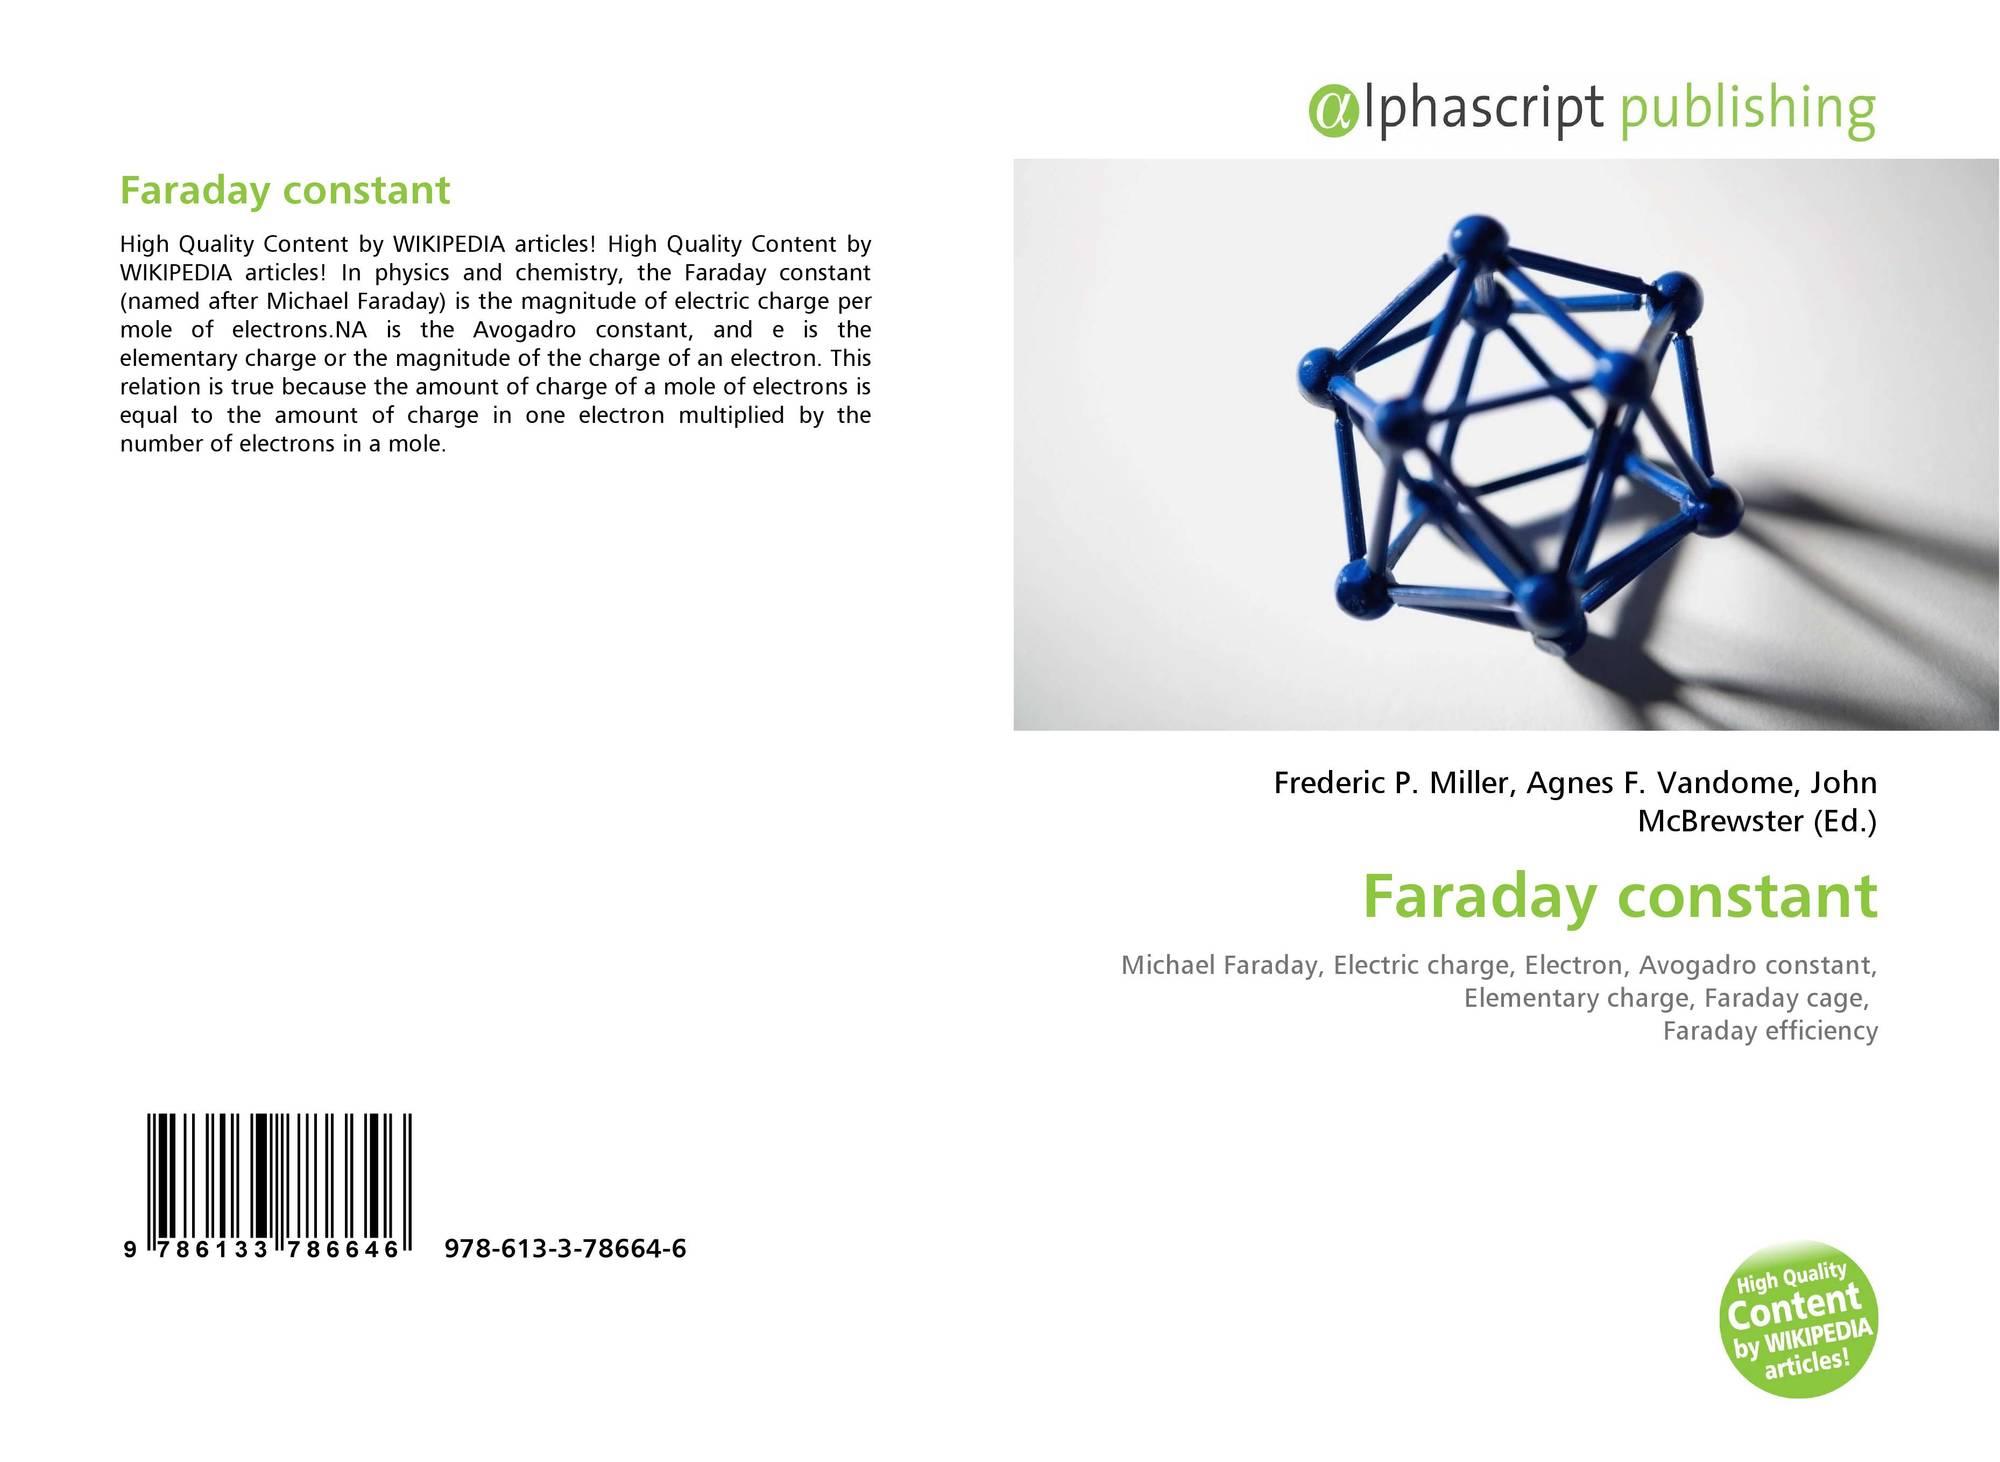 Faraday constant, 978-613-3-78664-6, 6133786647 ,9786133786646 on